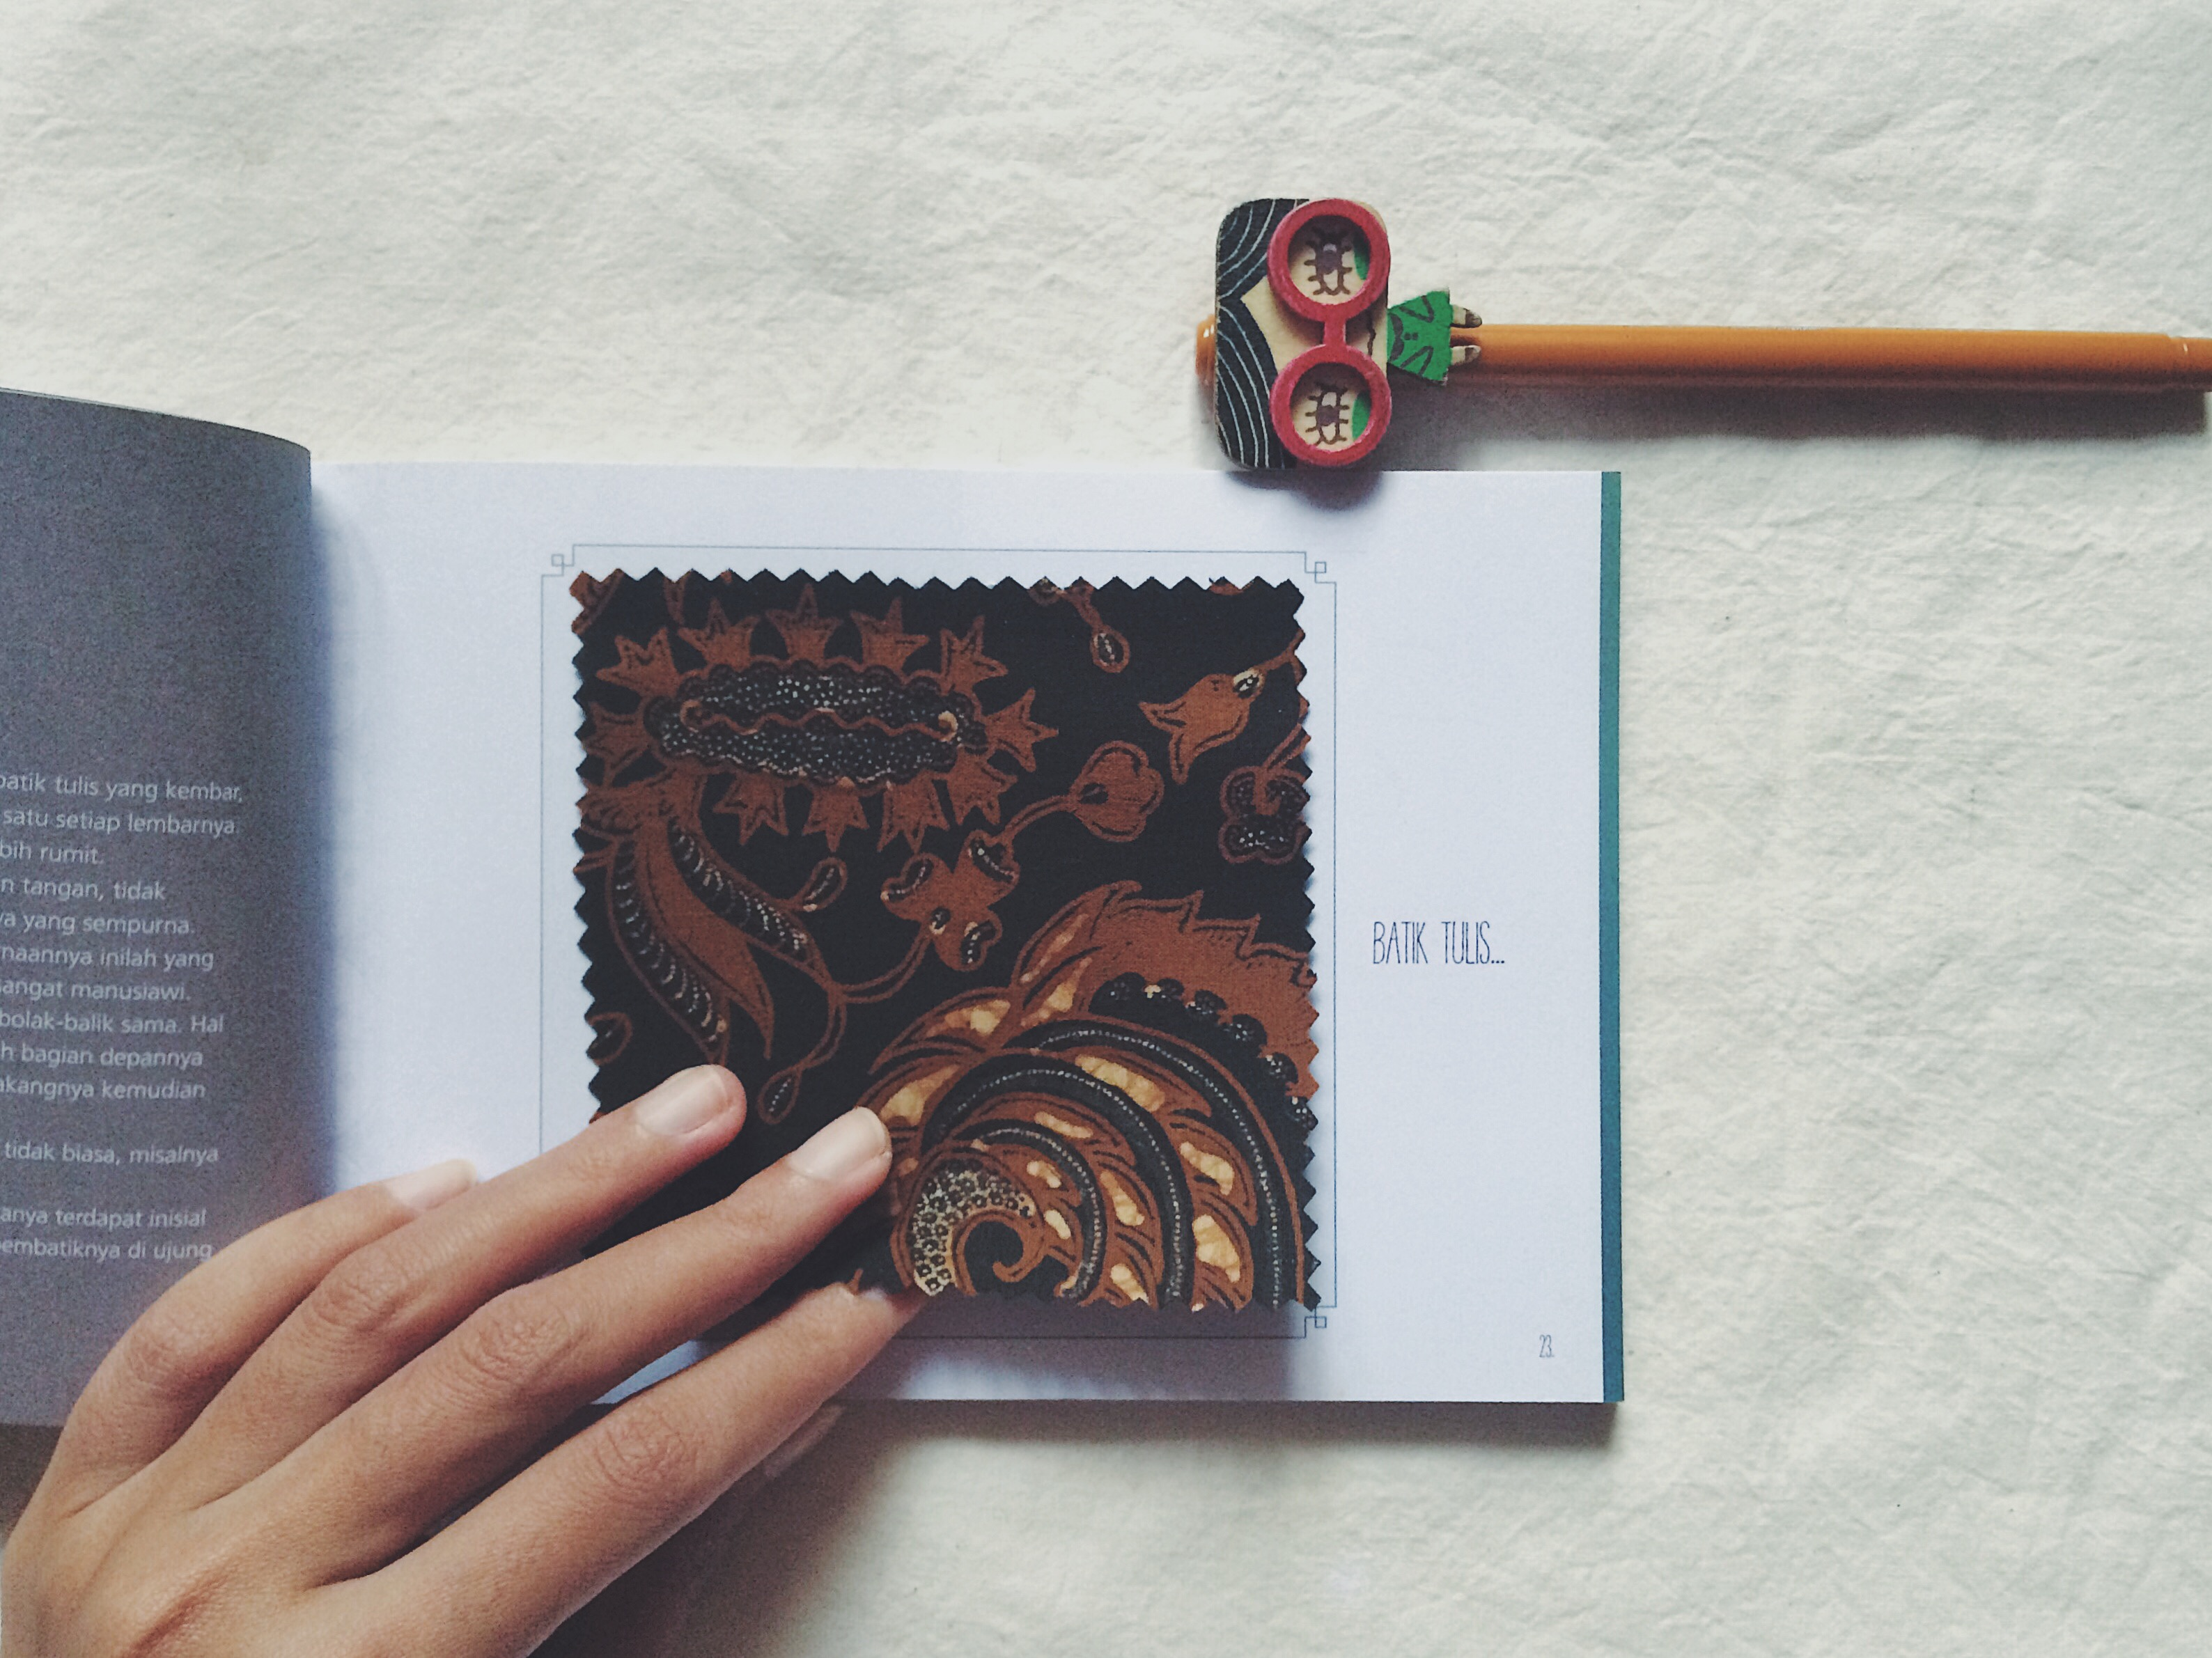 Buku Wastra Cerita Batik Bramandewi